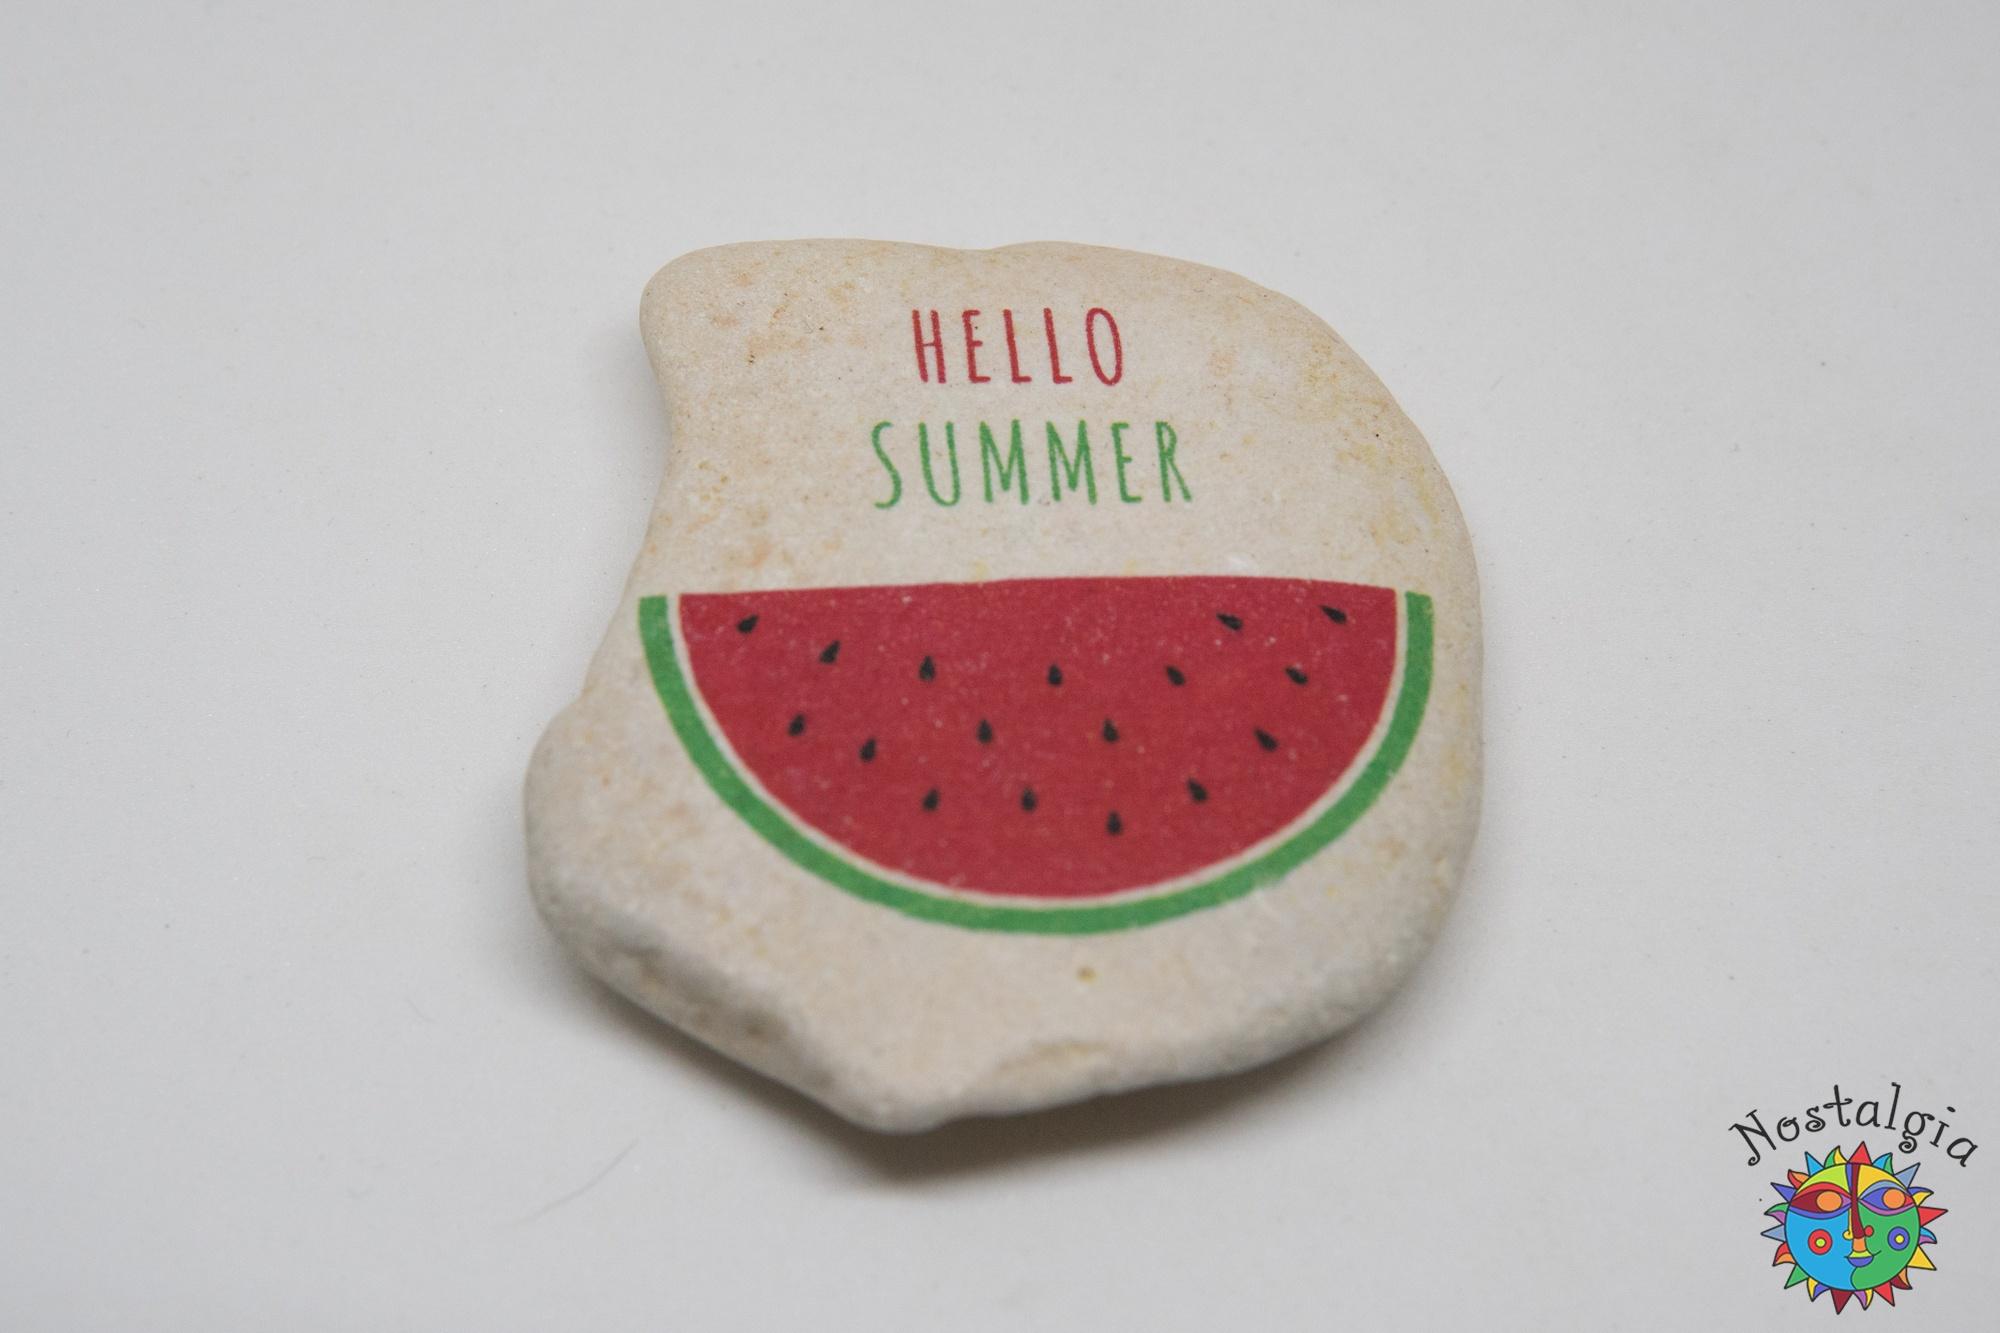 Hello summer Καρπούζι